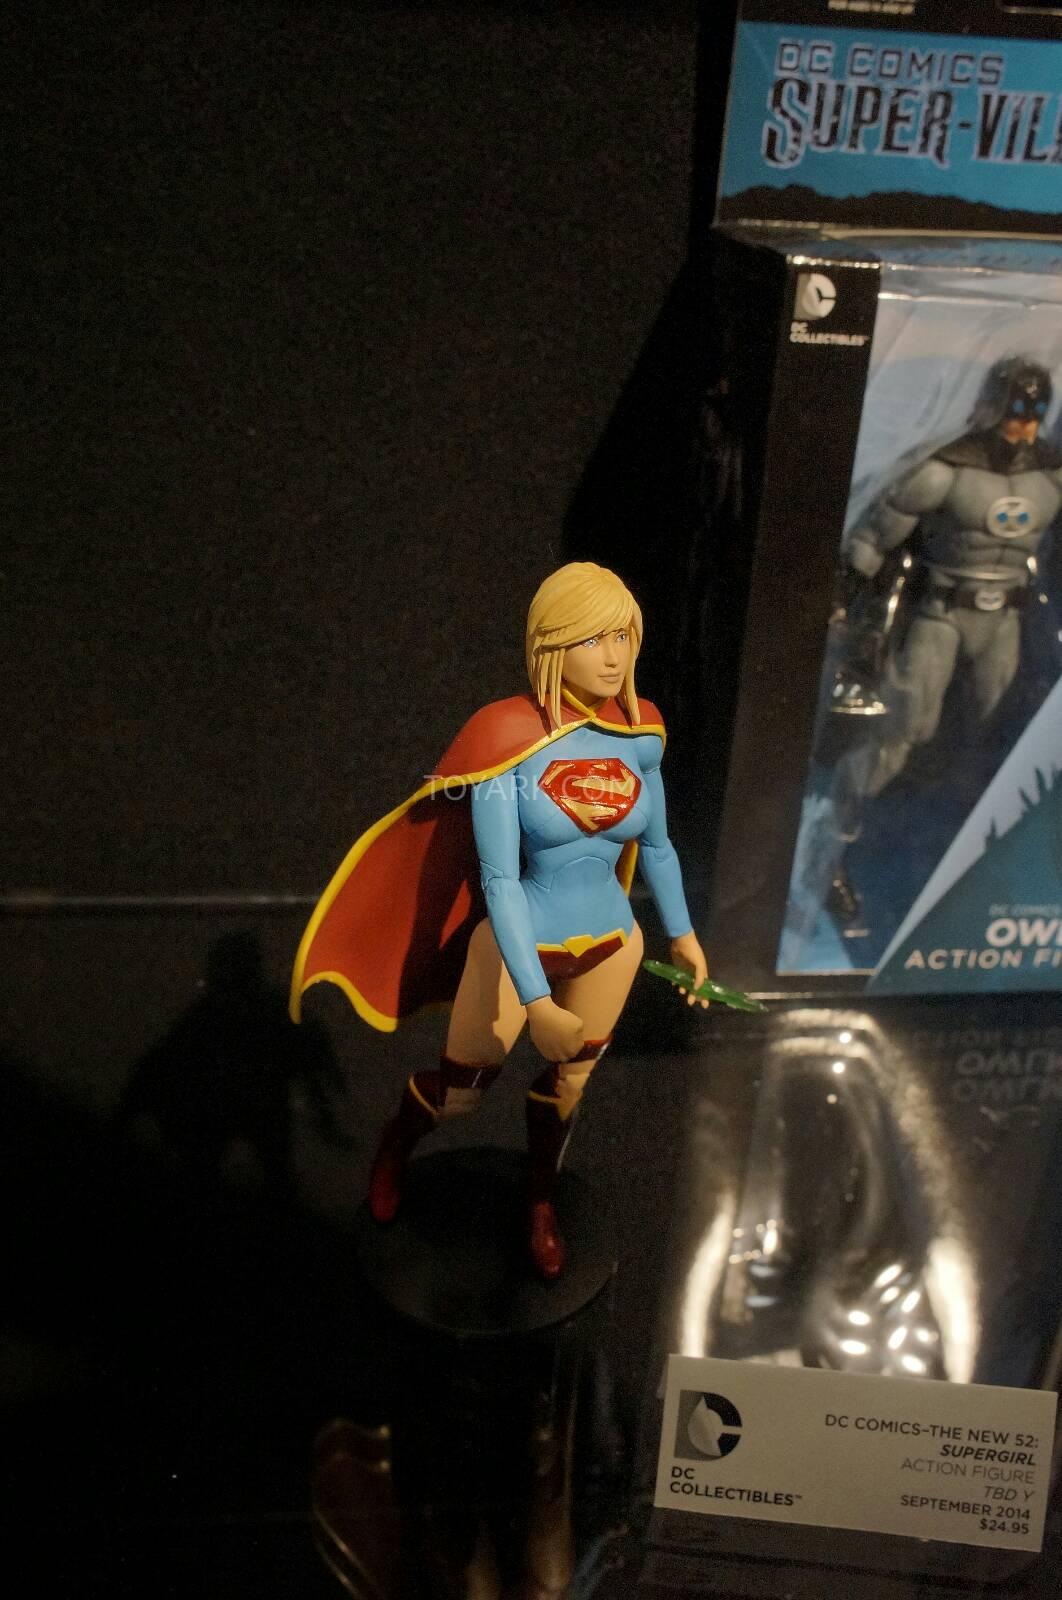 [Toy Fair 2014] DC Collectibles Toy-Fair-2014-DC-Collectibles-118